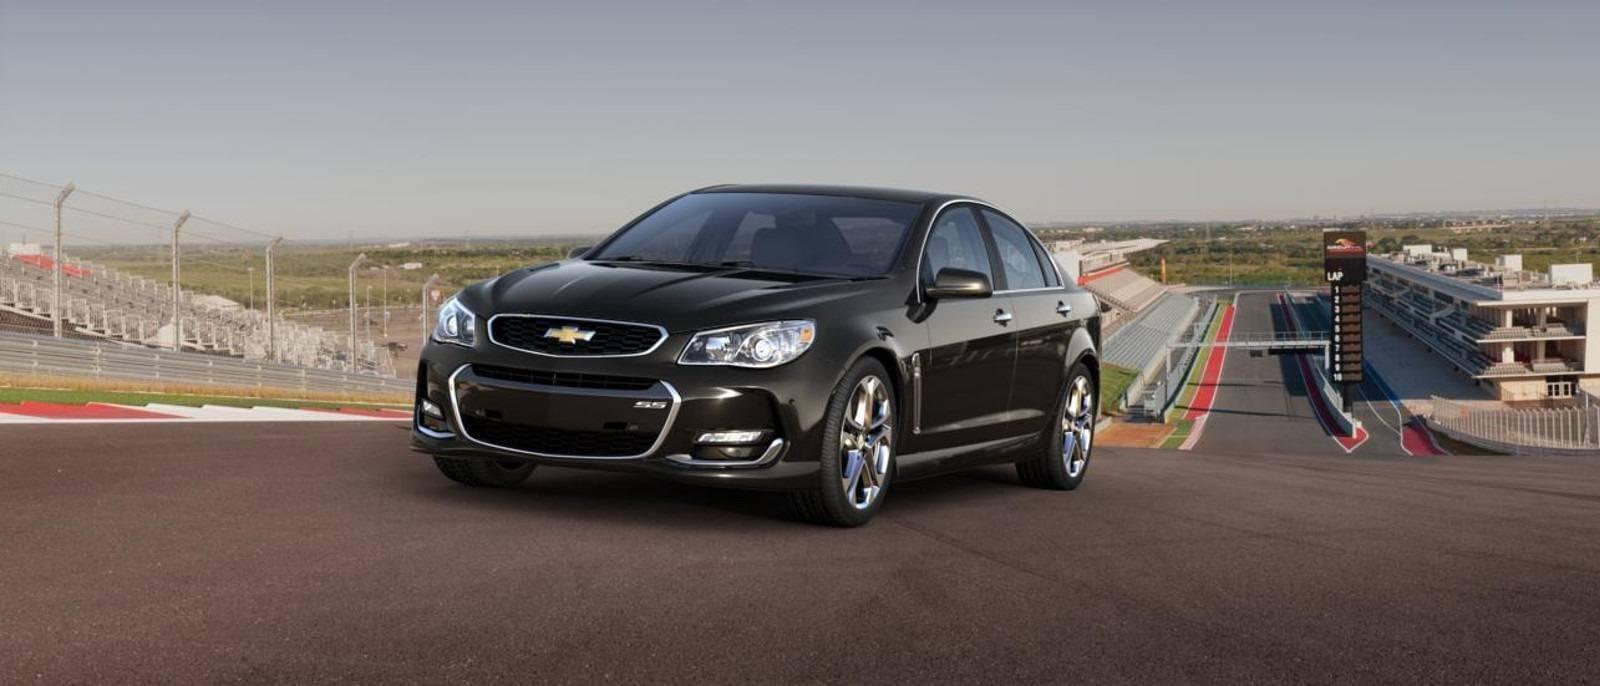 2017 Chevrolet SS Info   Price, MPG, Trims, Exterior, Performance